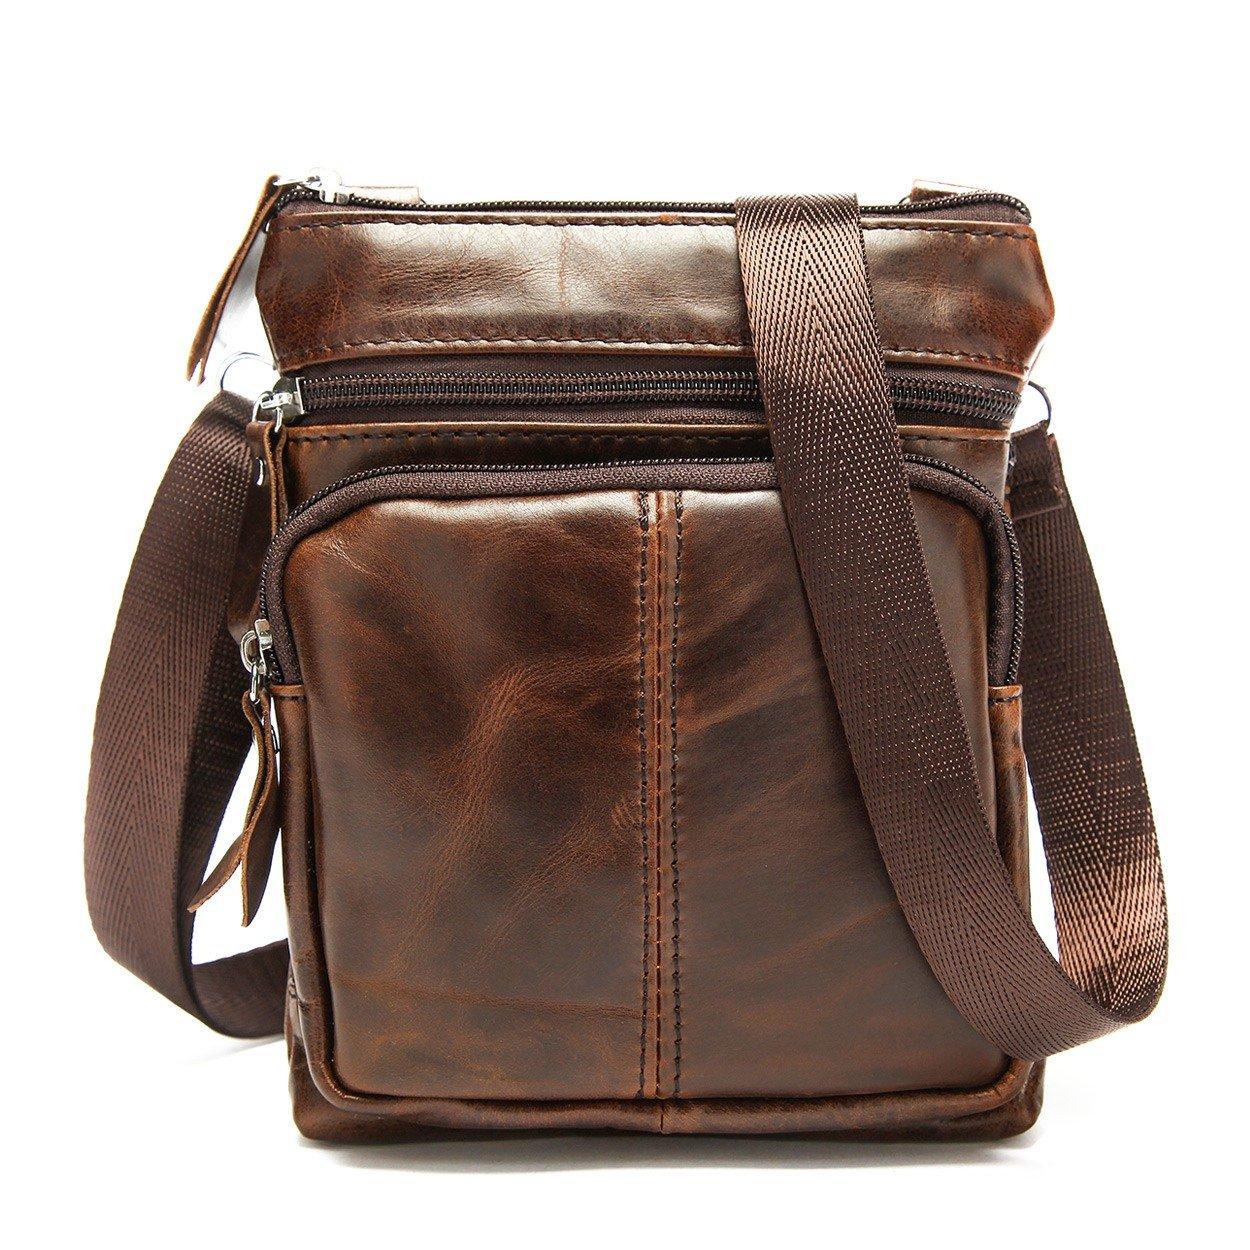 Leather Sling Bag for Men Chest Purse Crossbody Shoulder Bags Outdoor Backpack